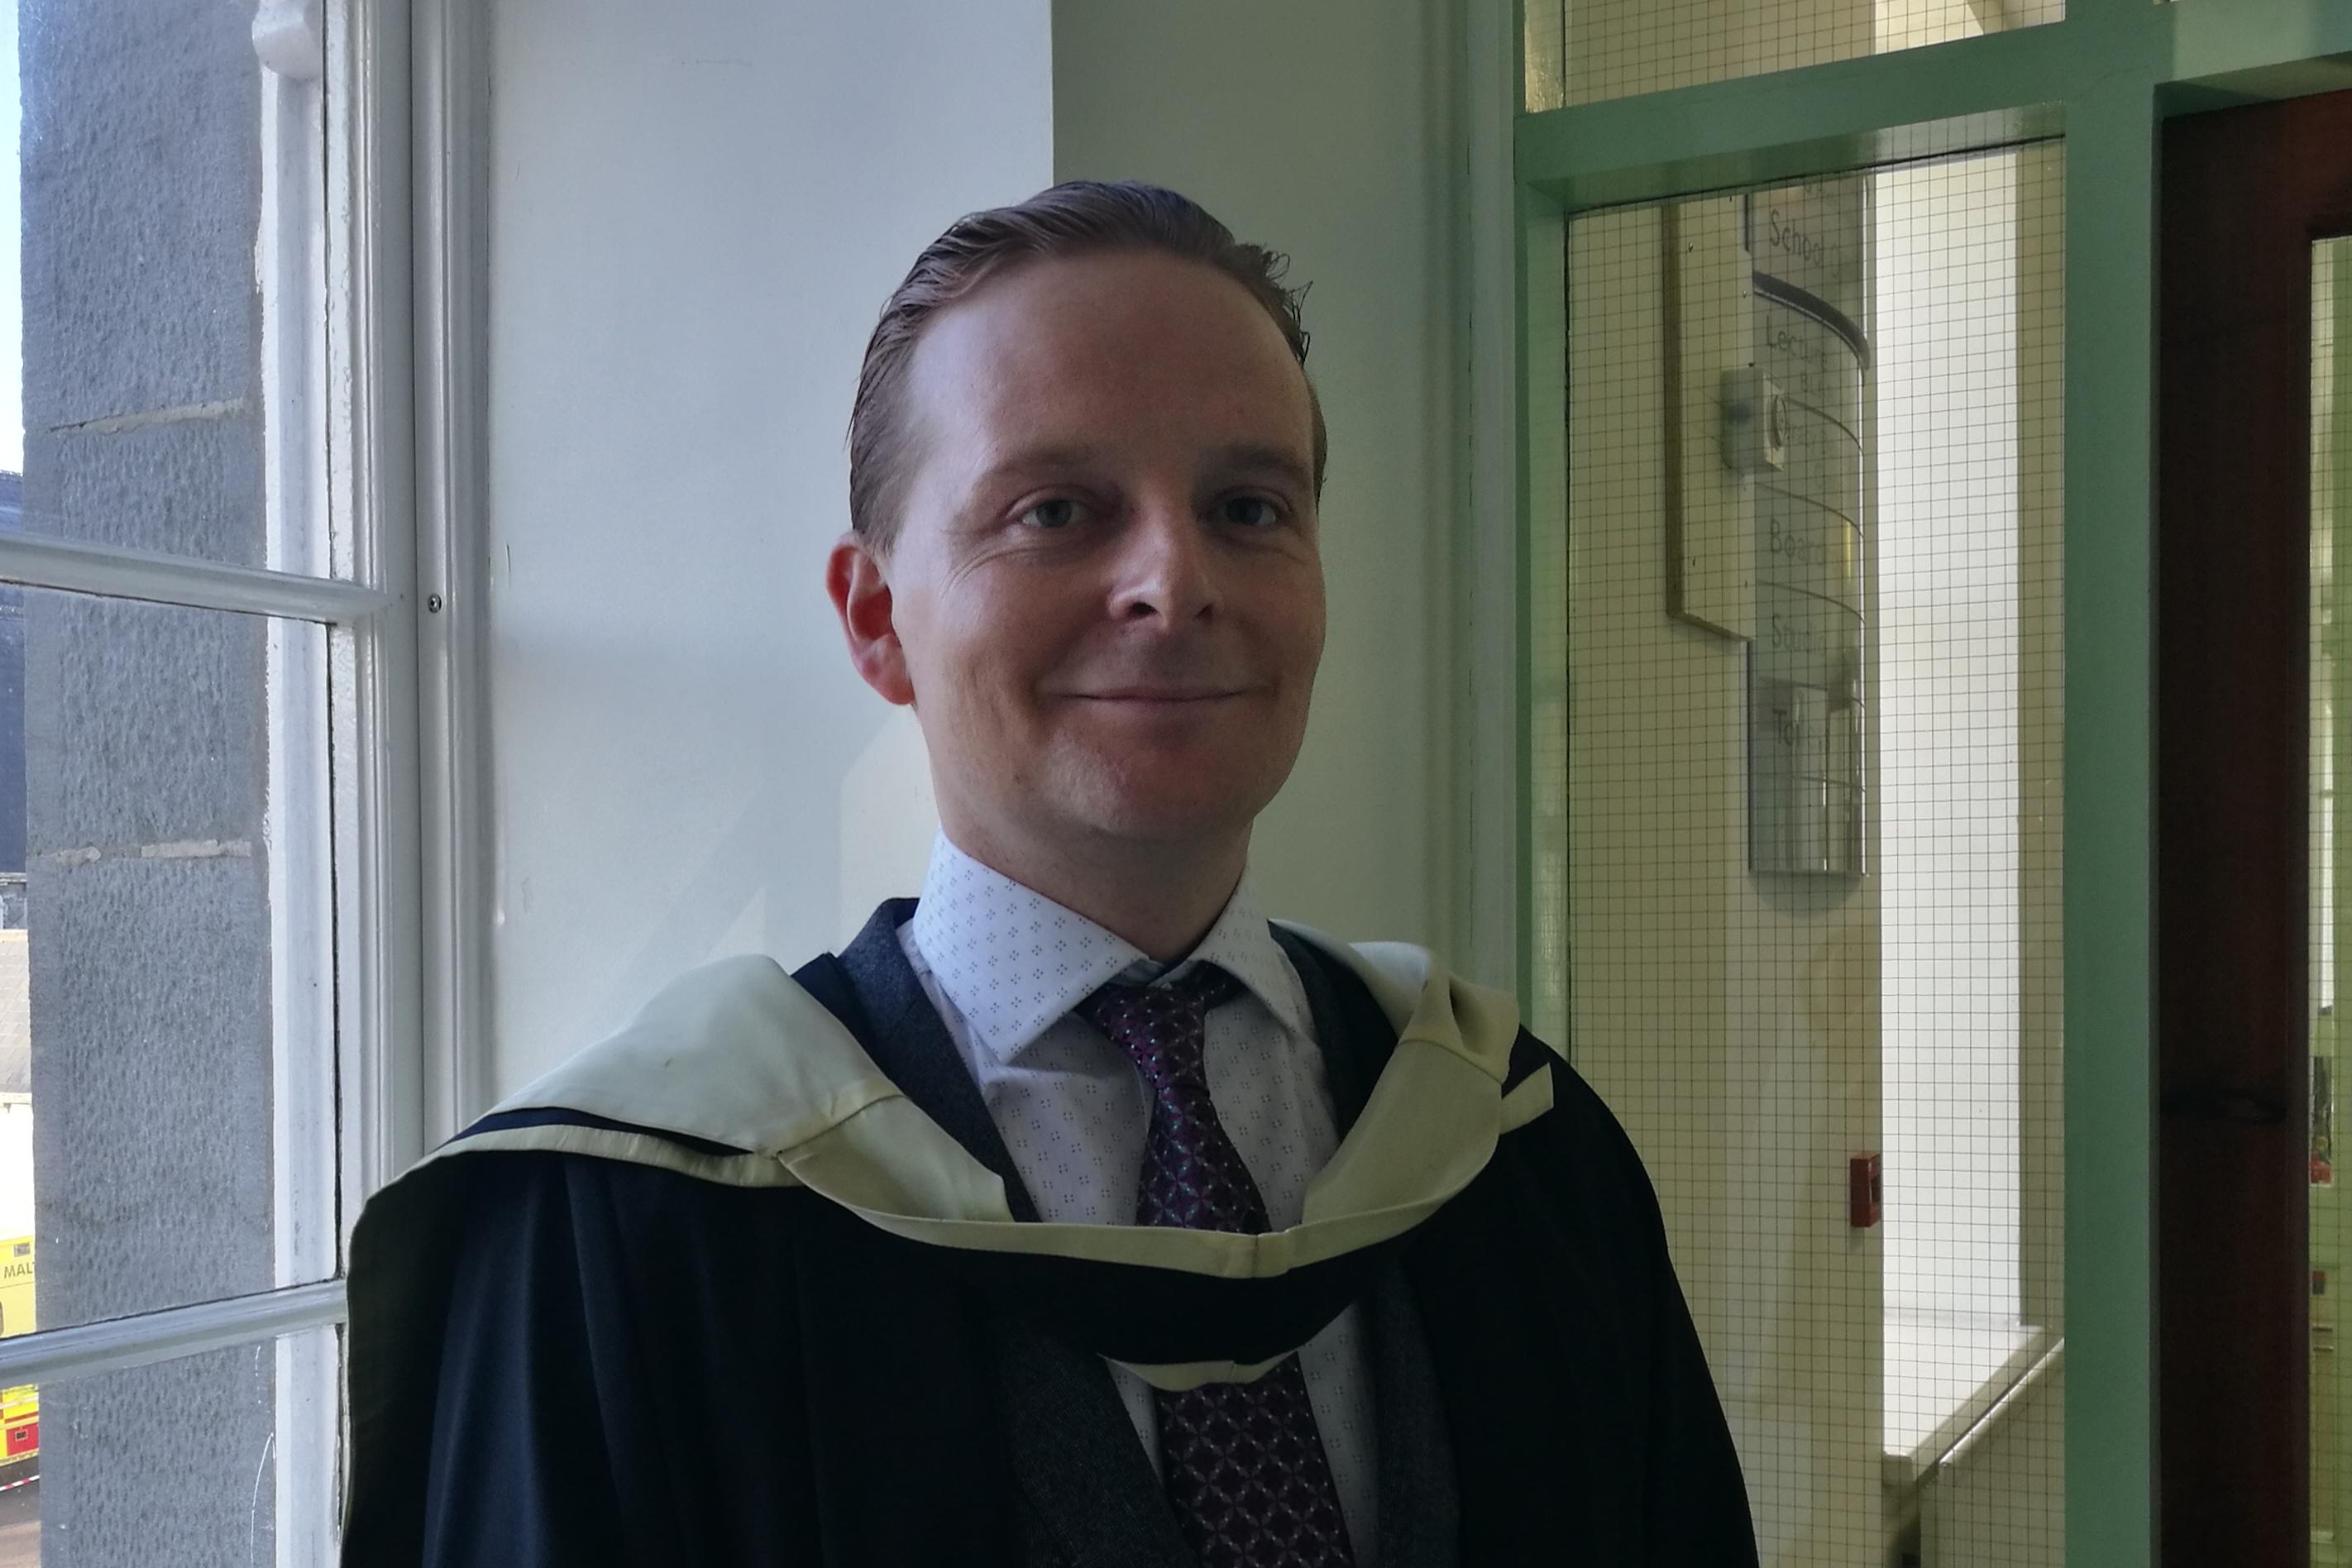 Oliver Lehane on graduation day 2017